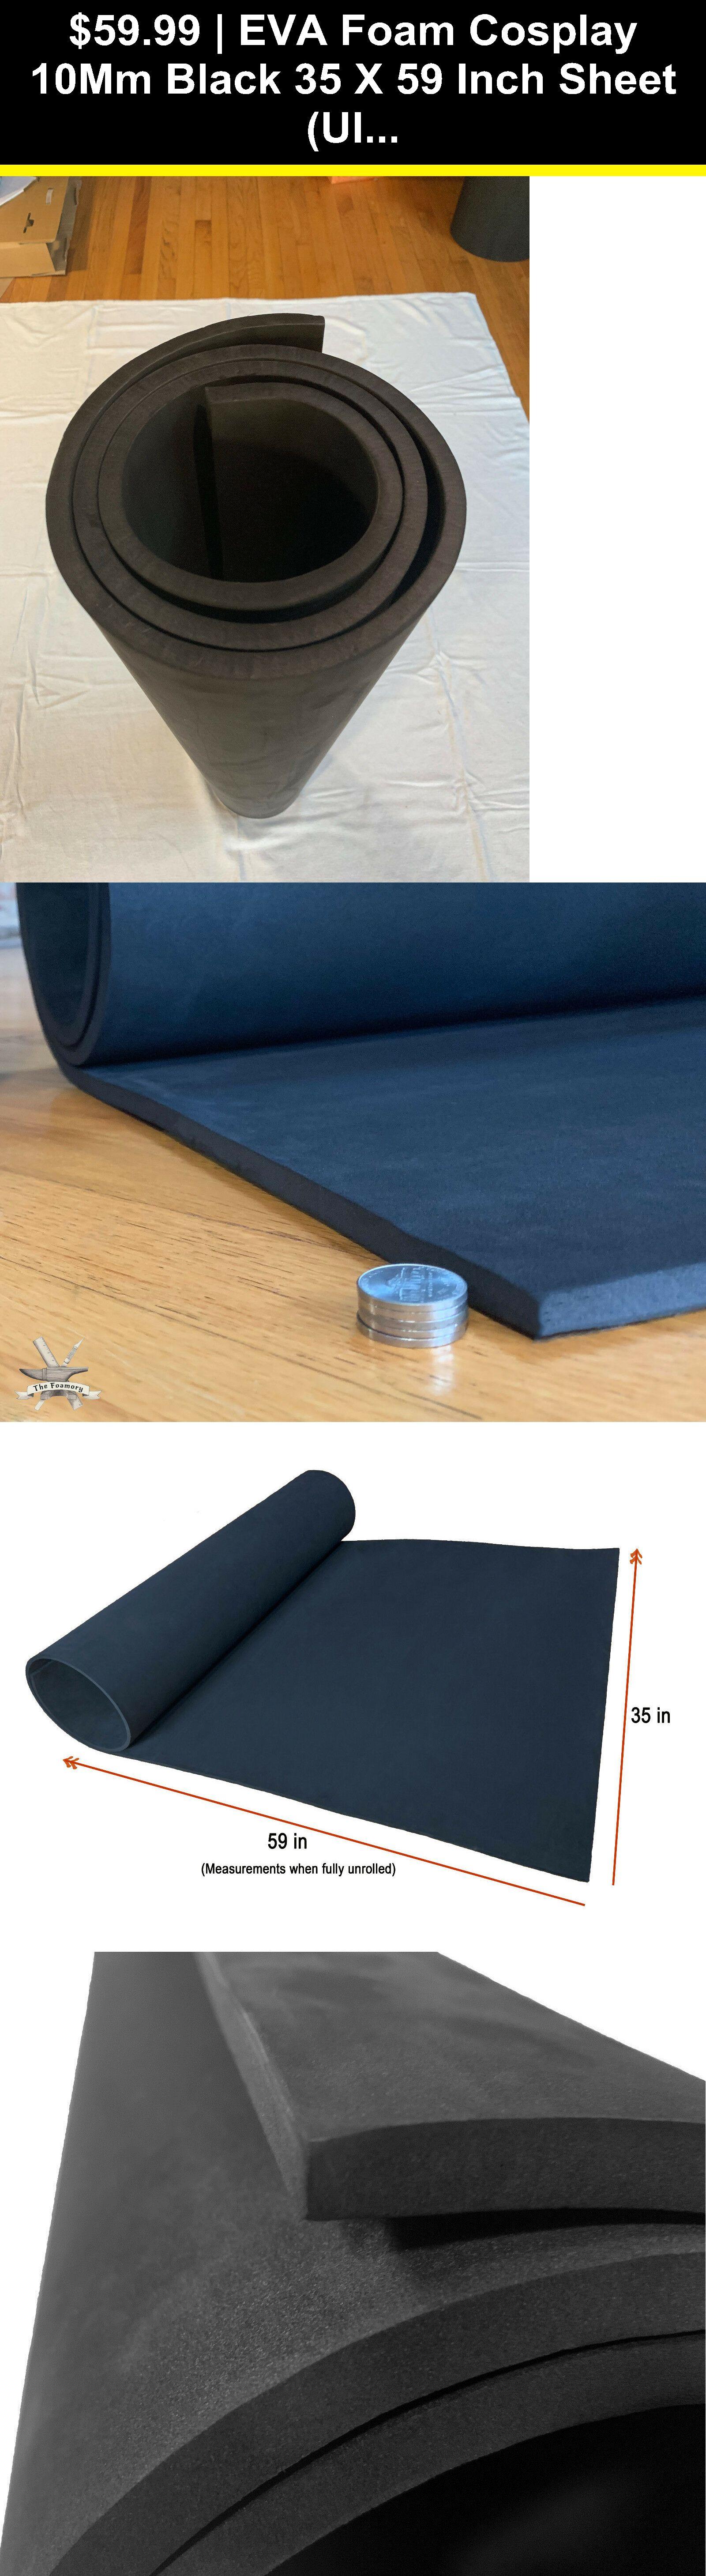 Styrofoam Forms 41200 Eva Foam Cosplay 10mm Black 35 X 59 Inch Sheet Ultra High Density Buy It Now Only